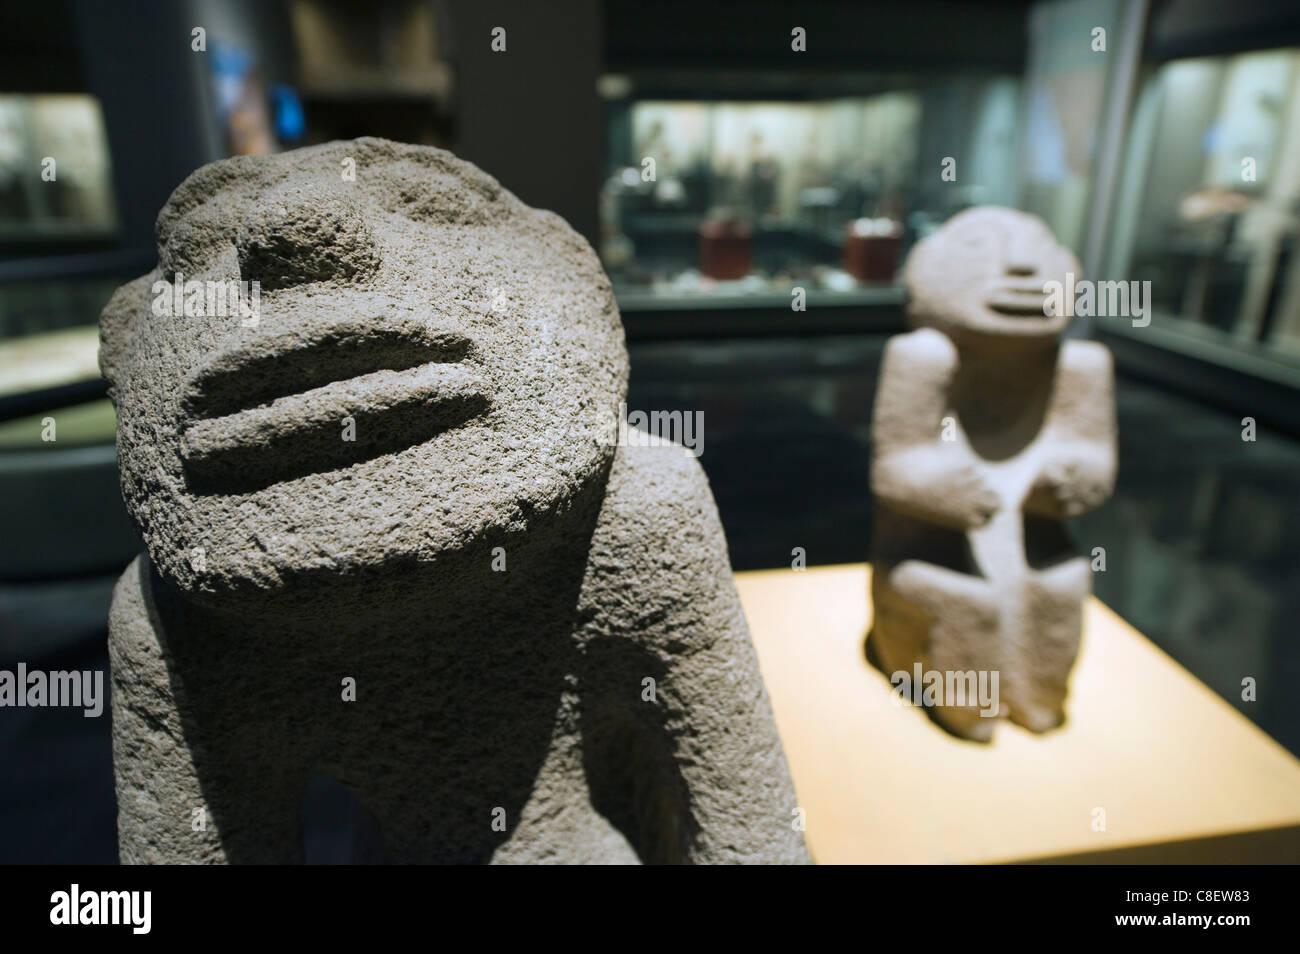 Mayan artefacts, Museo Nacional de Antropologia (Anthropology Museum, District Federal, Mexico City, Mexico - Stock Image